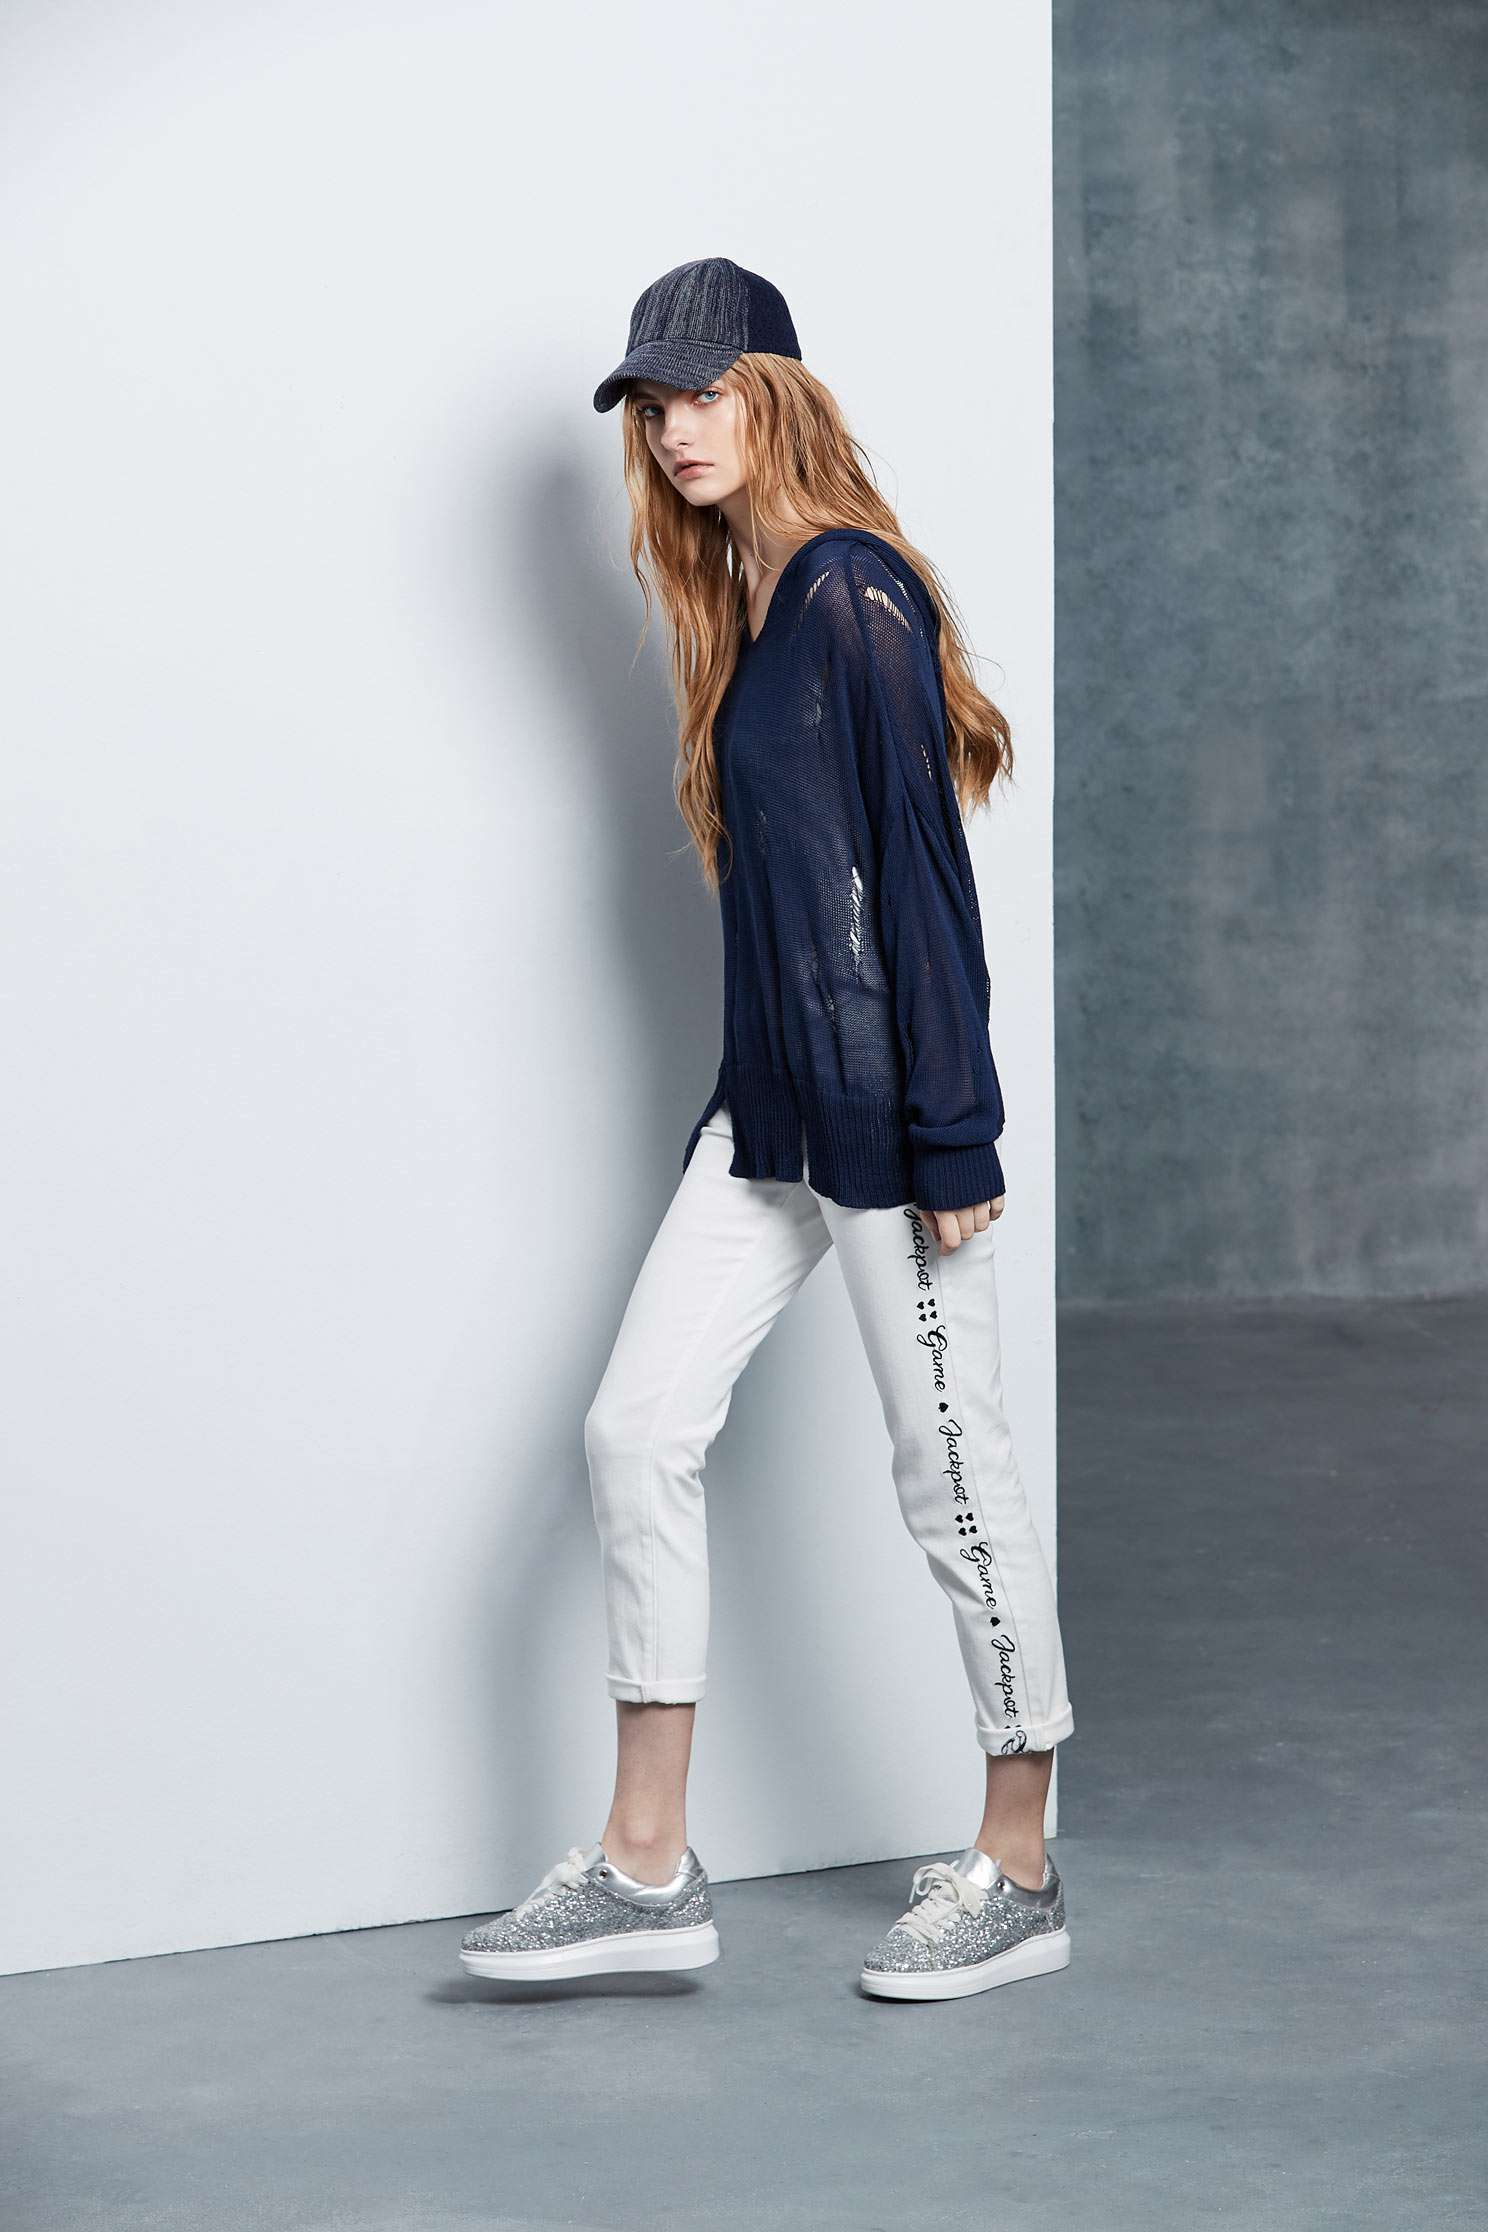 Slogan popular denim trousers,tanning,cowboy,jeans,sdenimtrousers,whitepants,whitepants,embroidered,pants,thinpants